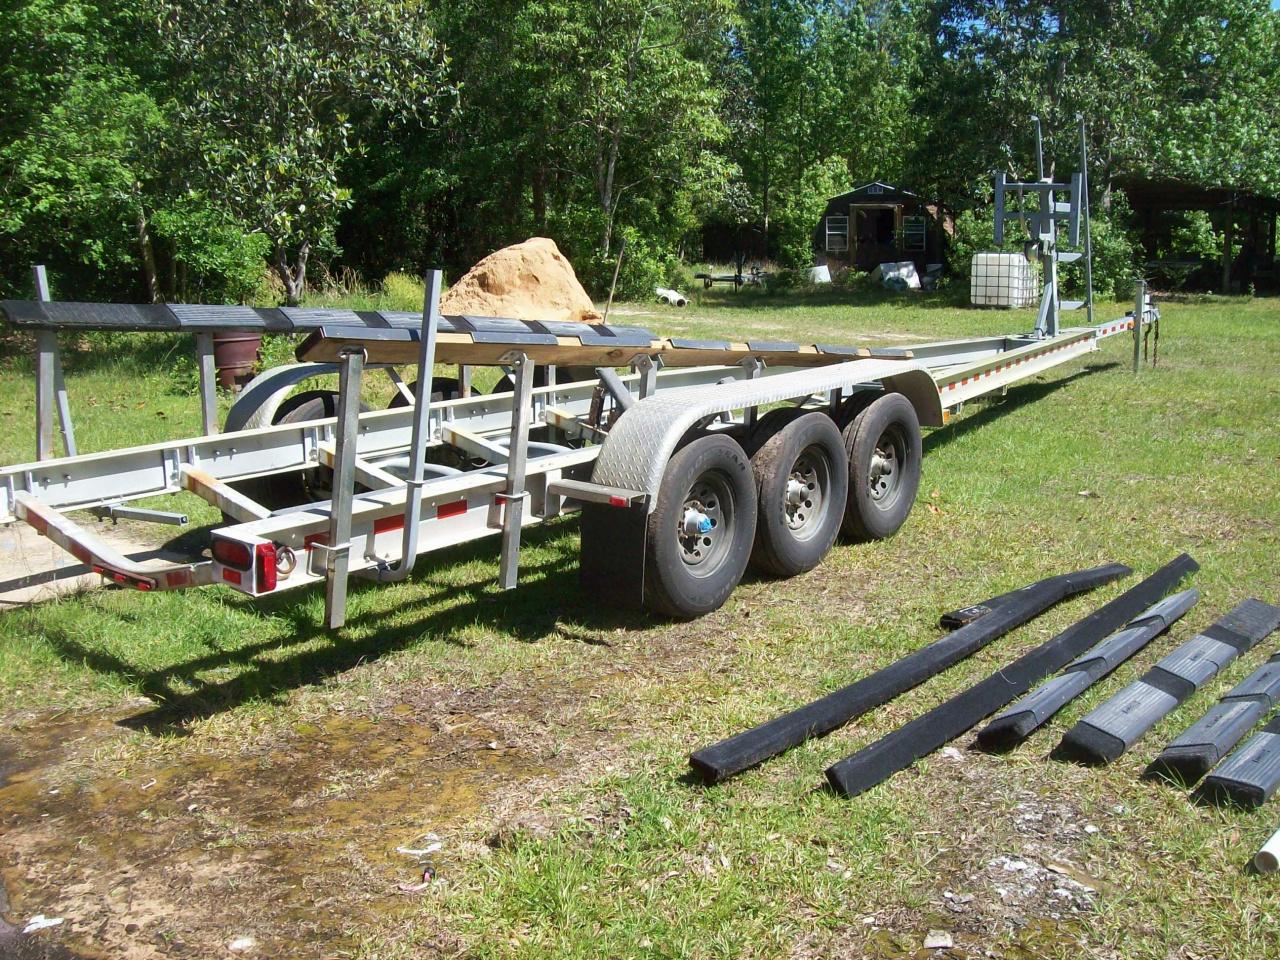 triple axle alum boat trailer - Pensacola Fishing Forum